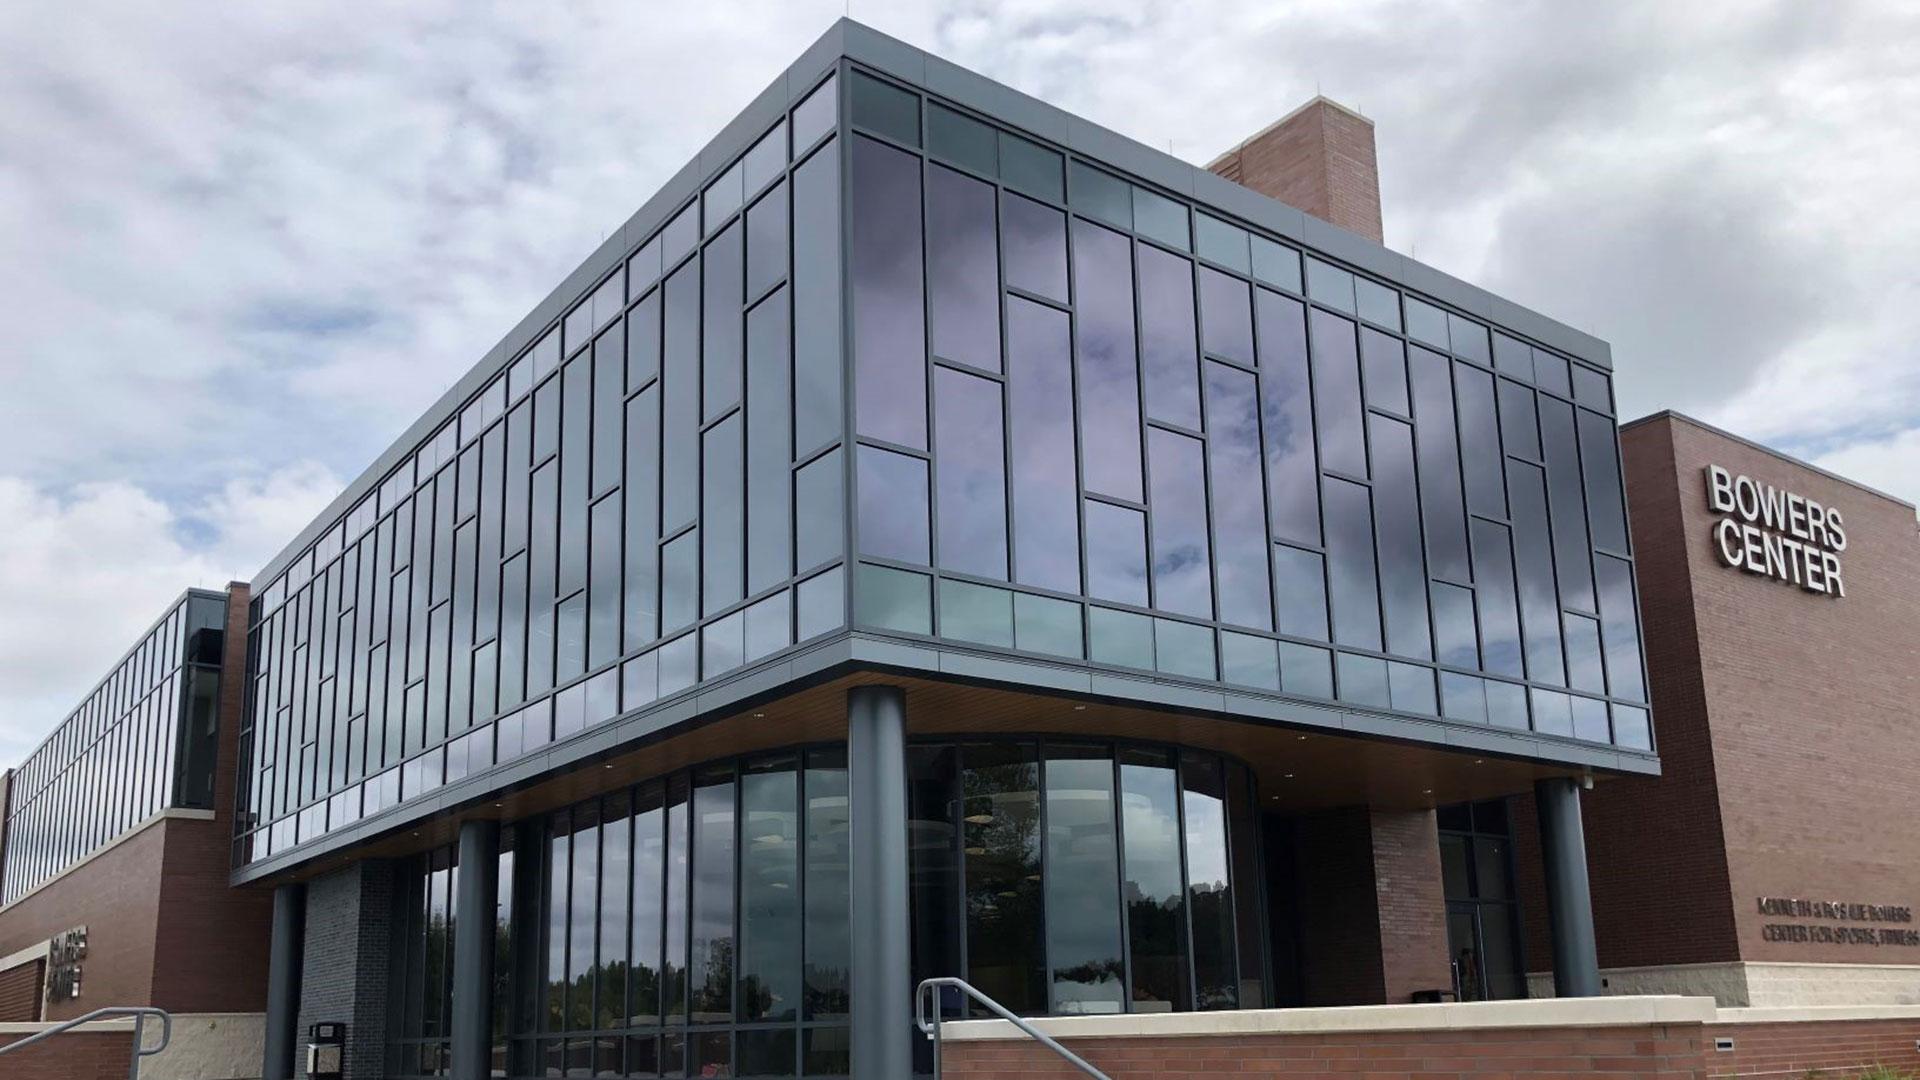 Bowers Center at Elizabethtown College